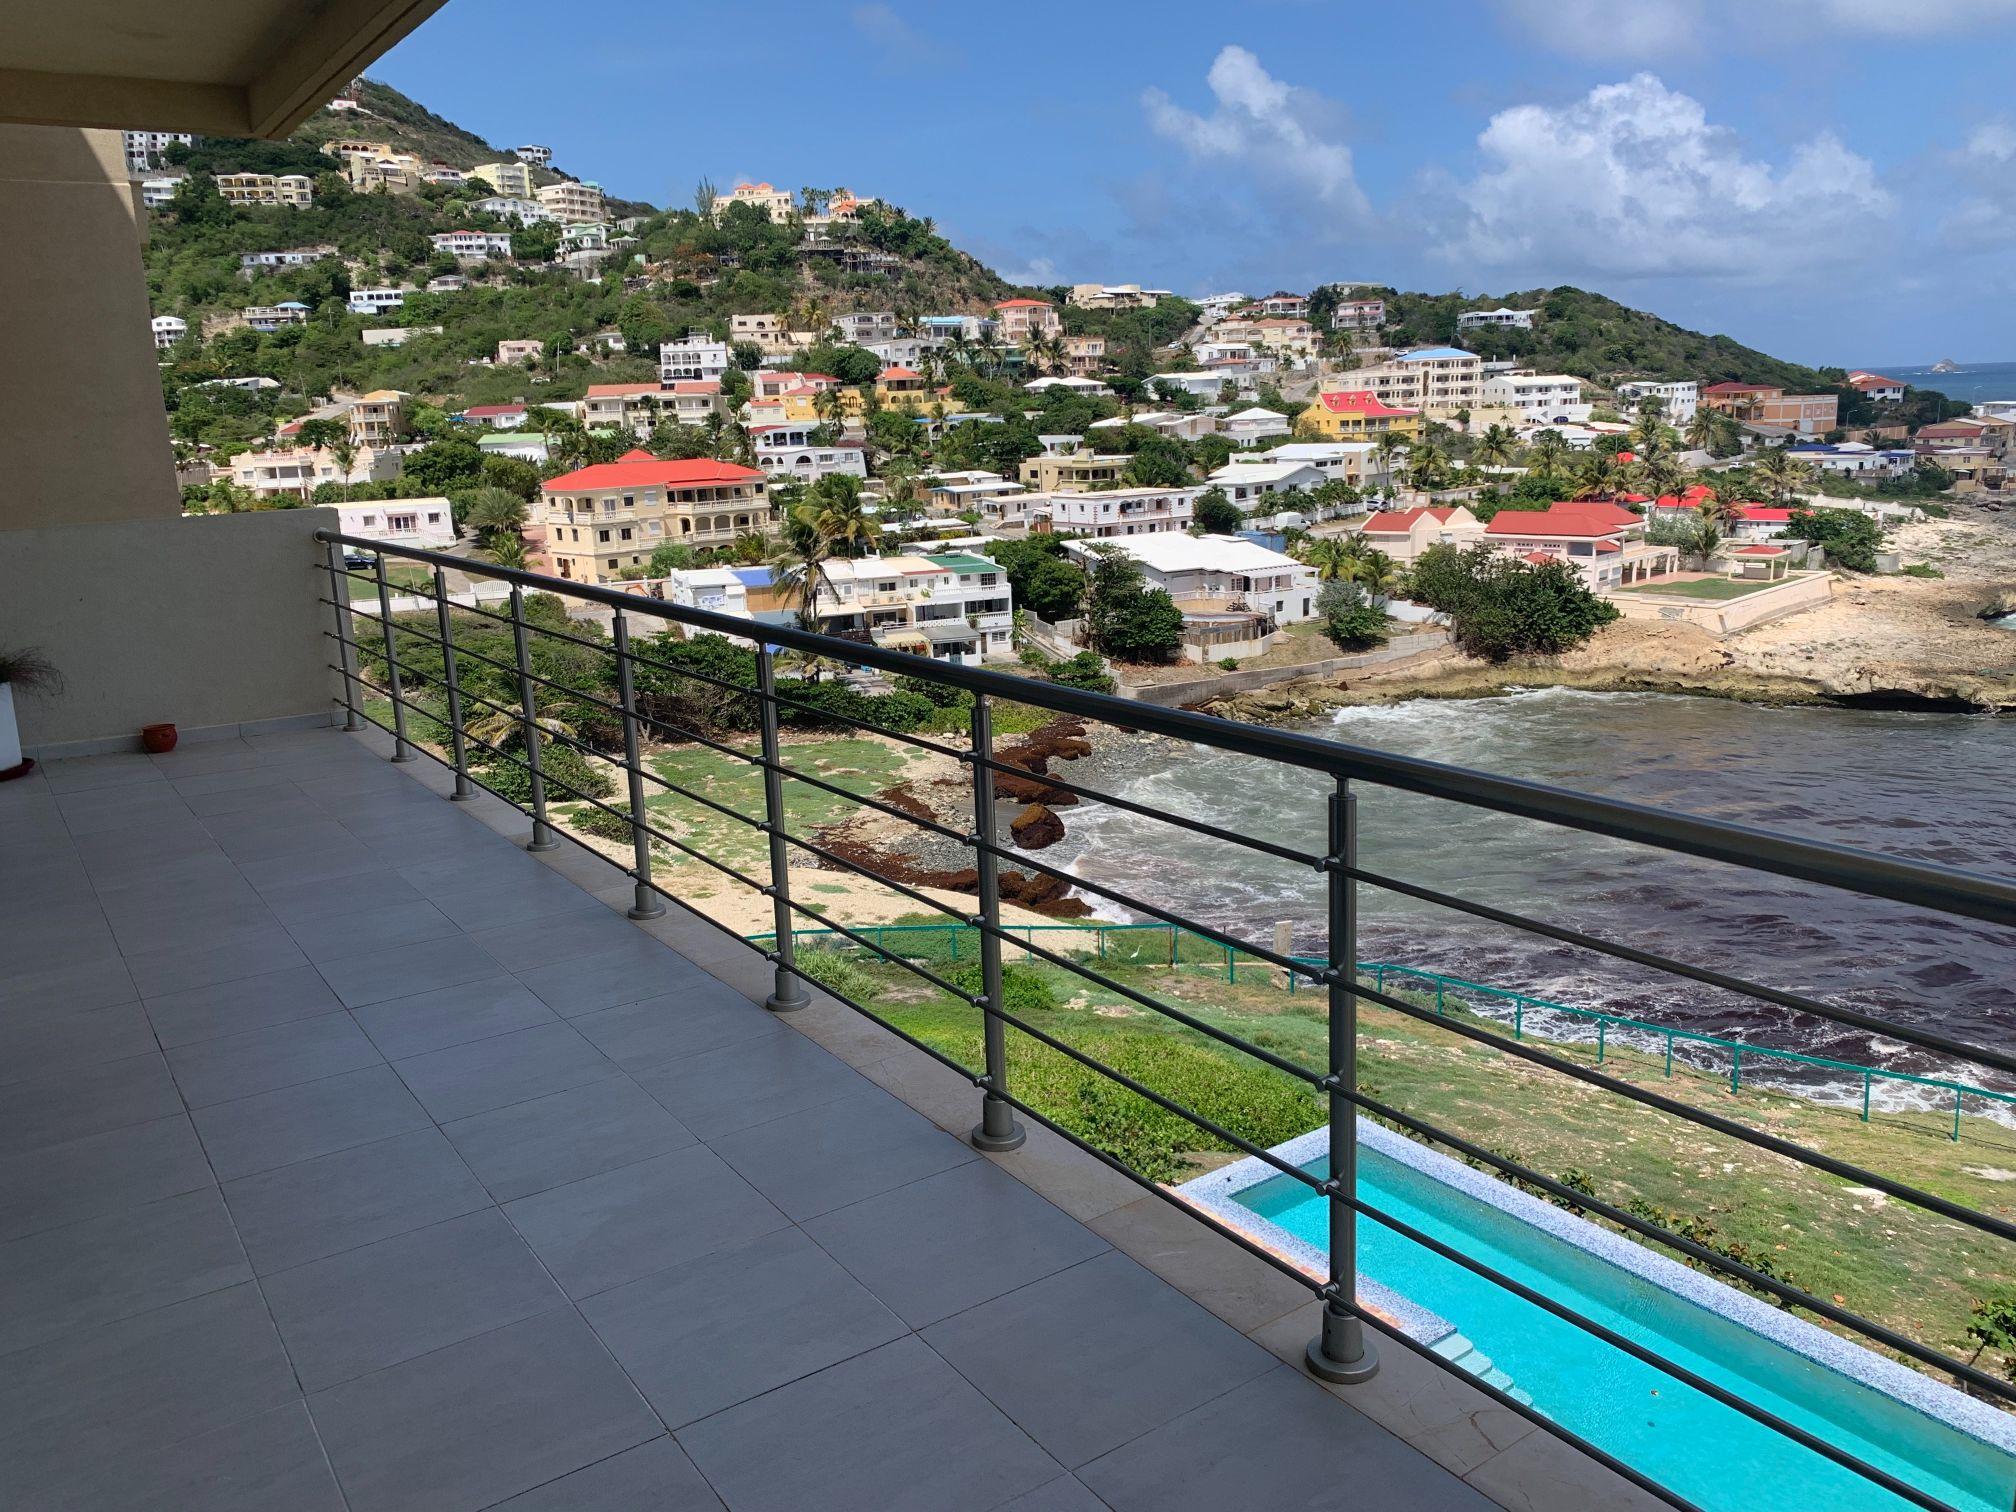 Seneca Point Blanche Oceanfront Condo For Rent